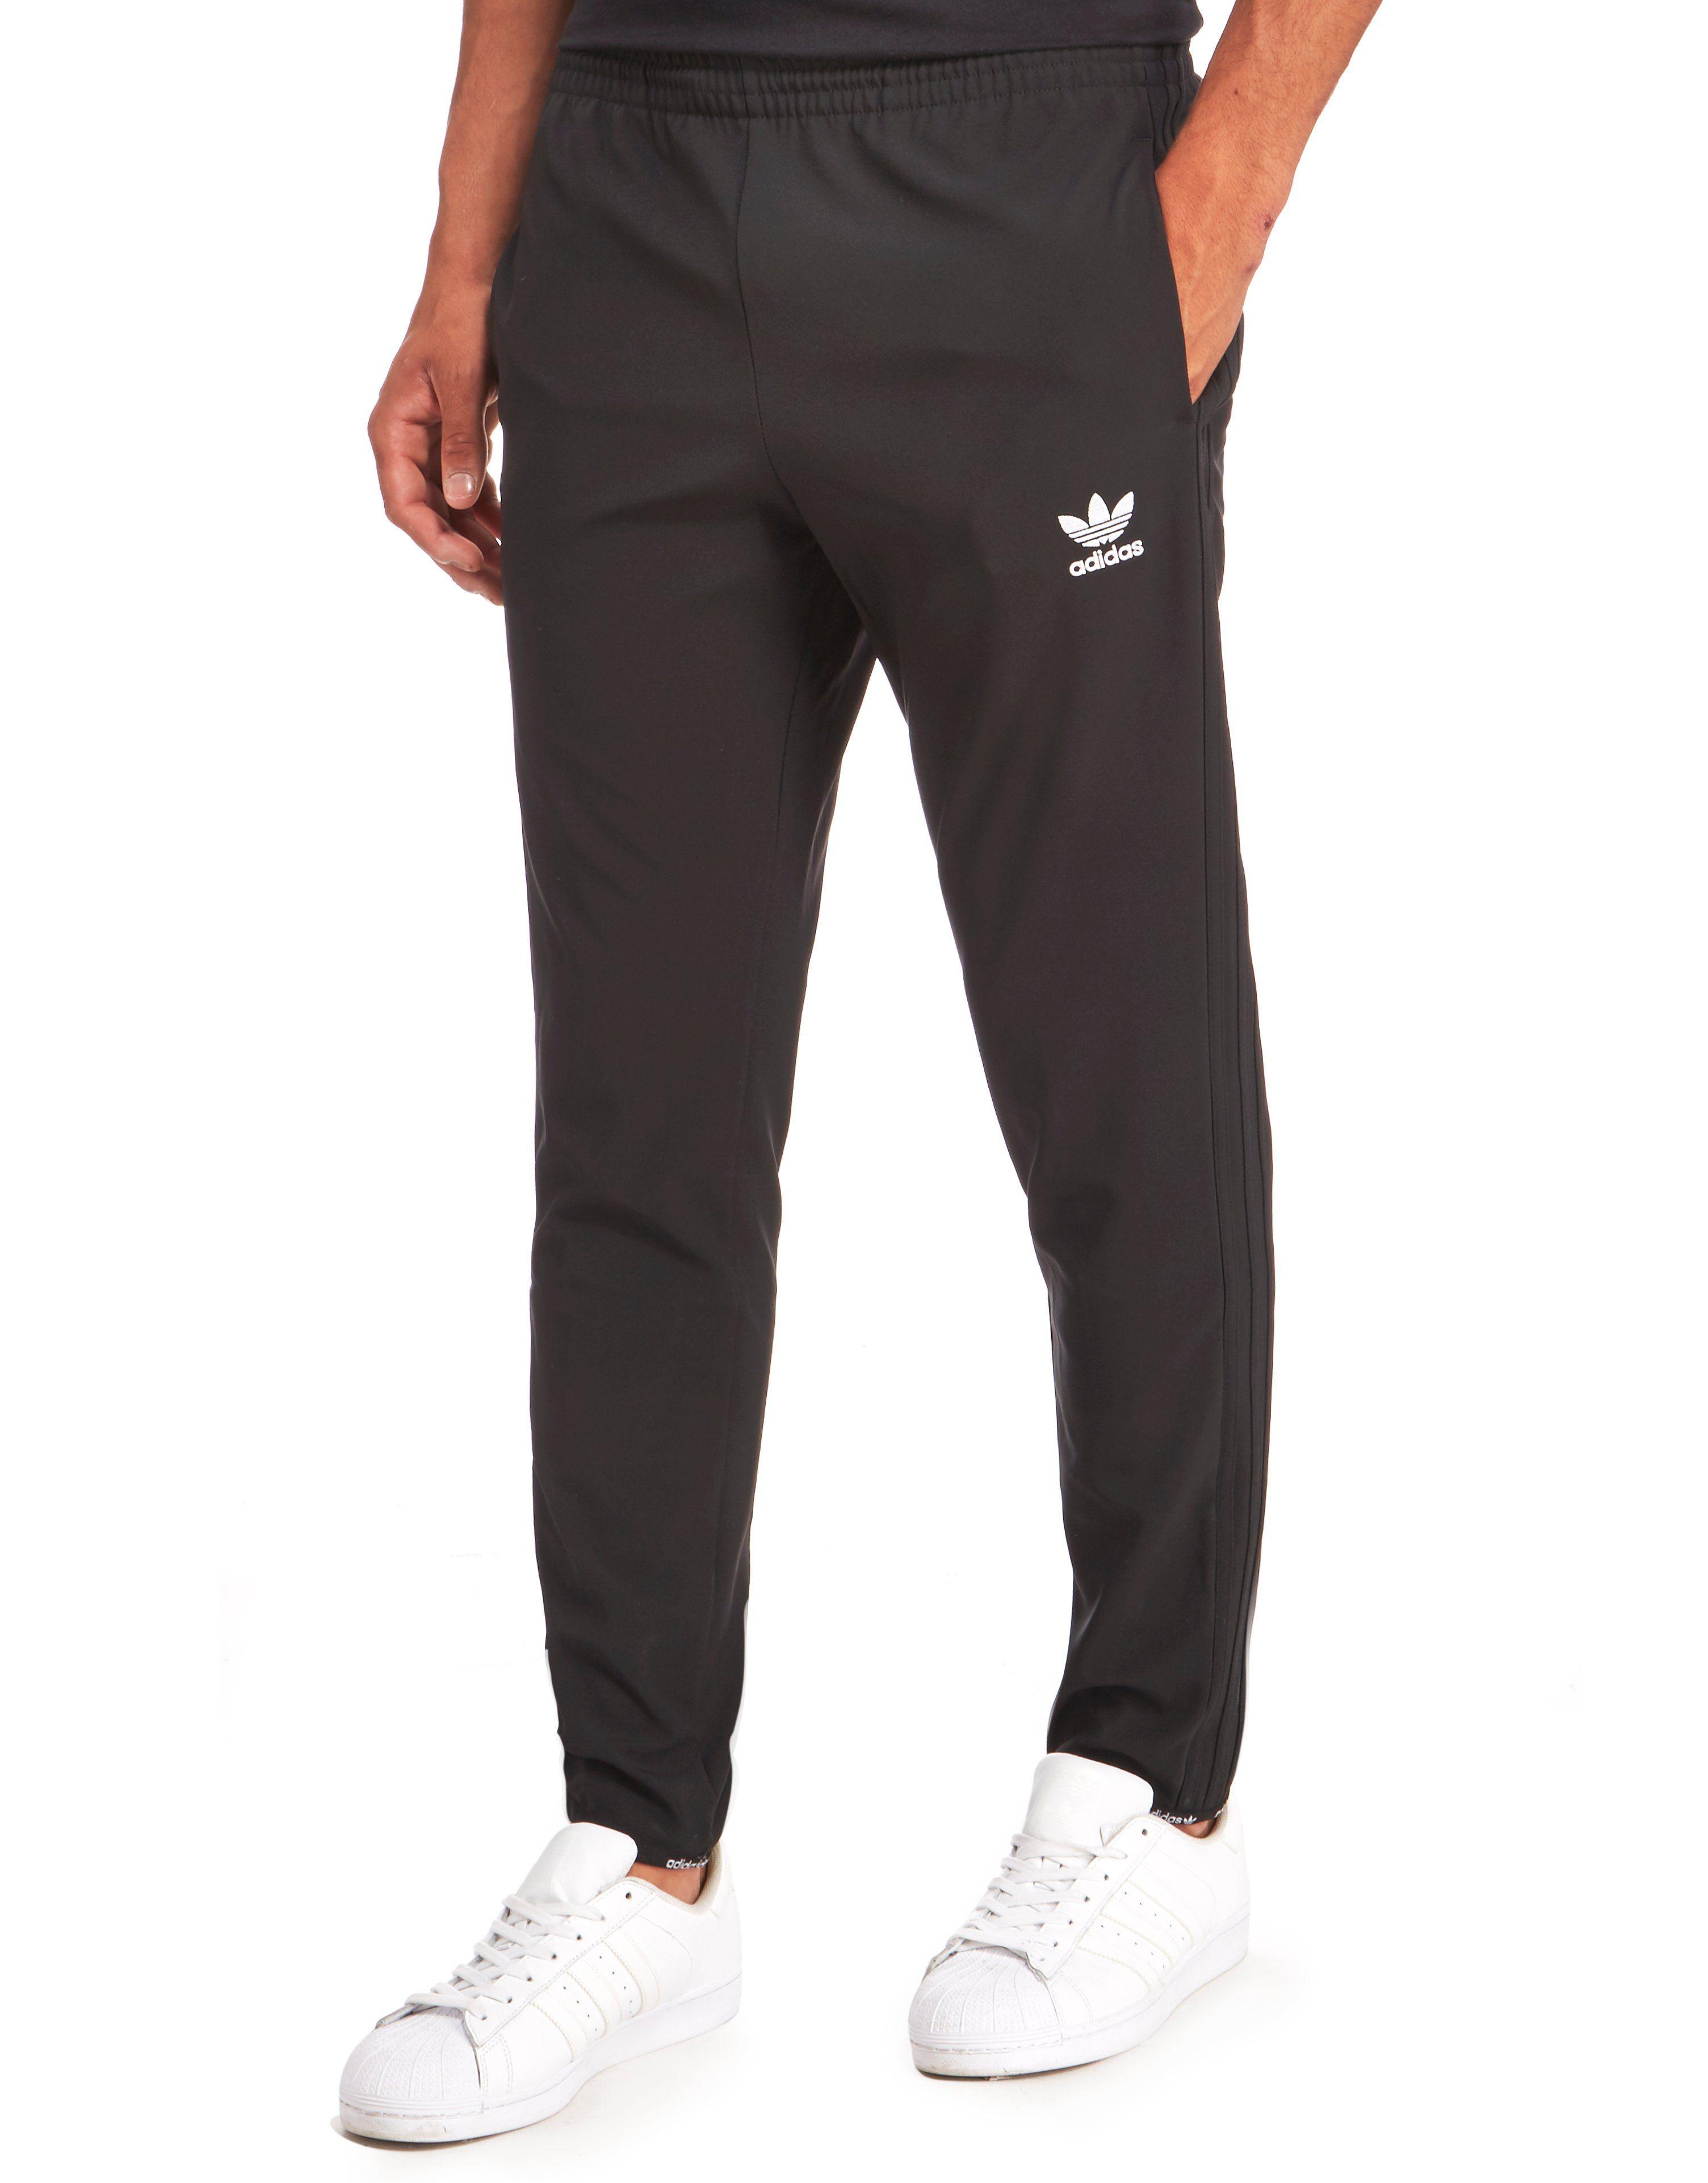 adidas Originals Superstar 2.0 Poly Track Pants   JD Sports Ireland